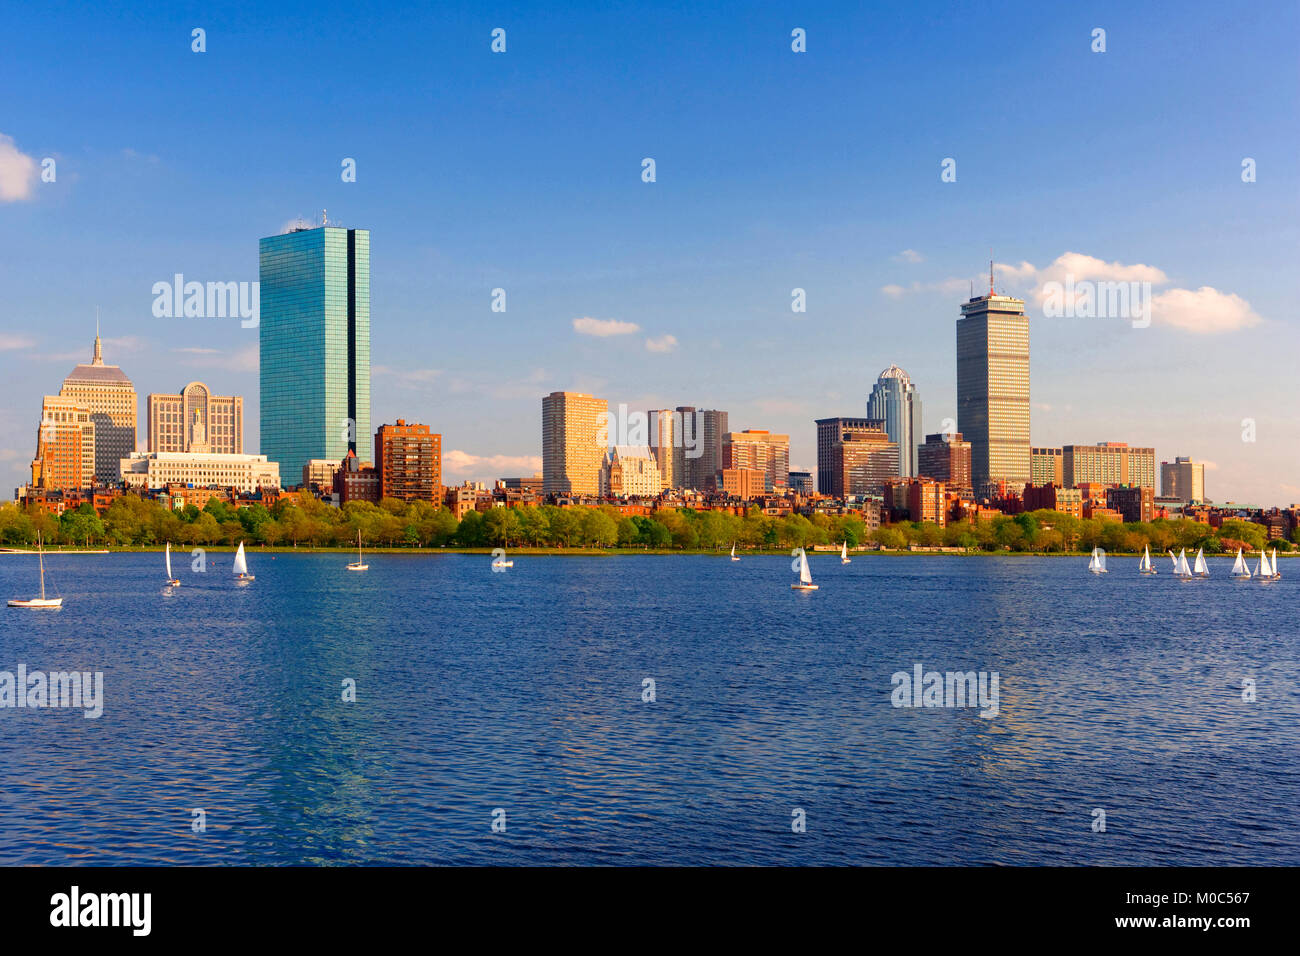 Horizonte de Boston visto sobre el río Charles, Massachusetts, EE.UU. Imagen De Stock